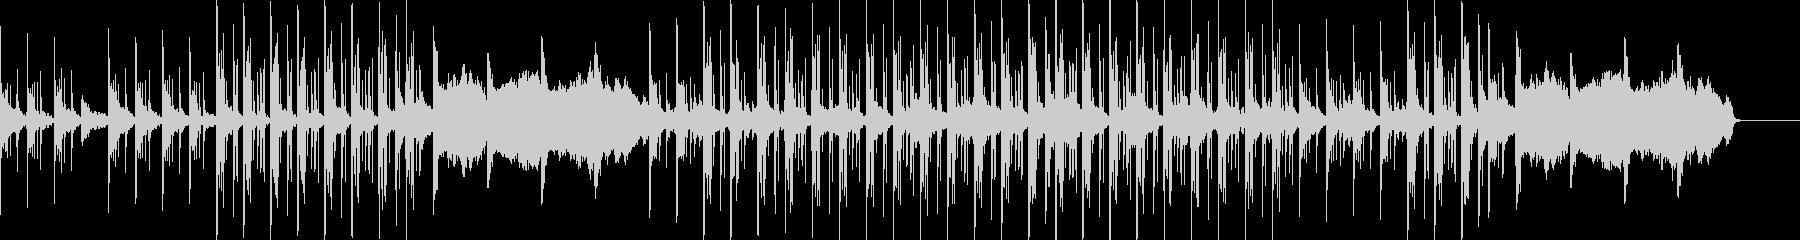 Jazzyなピアノとミニマルなリズムの未再生の波形